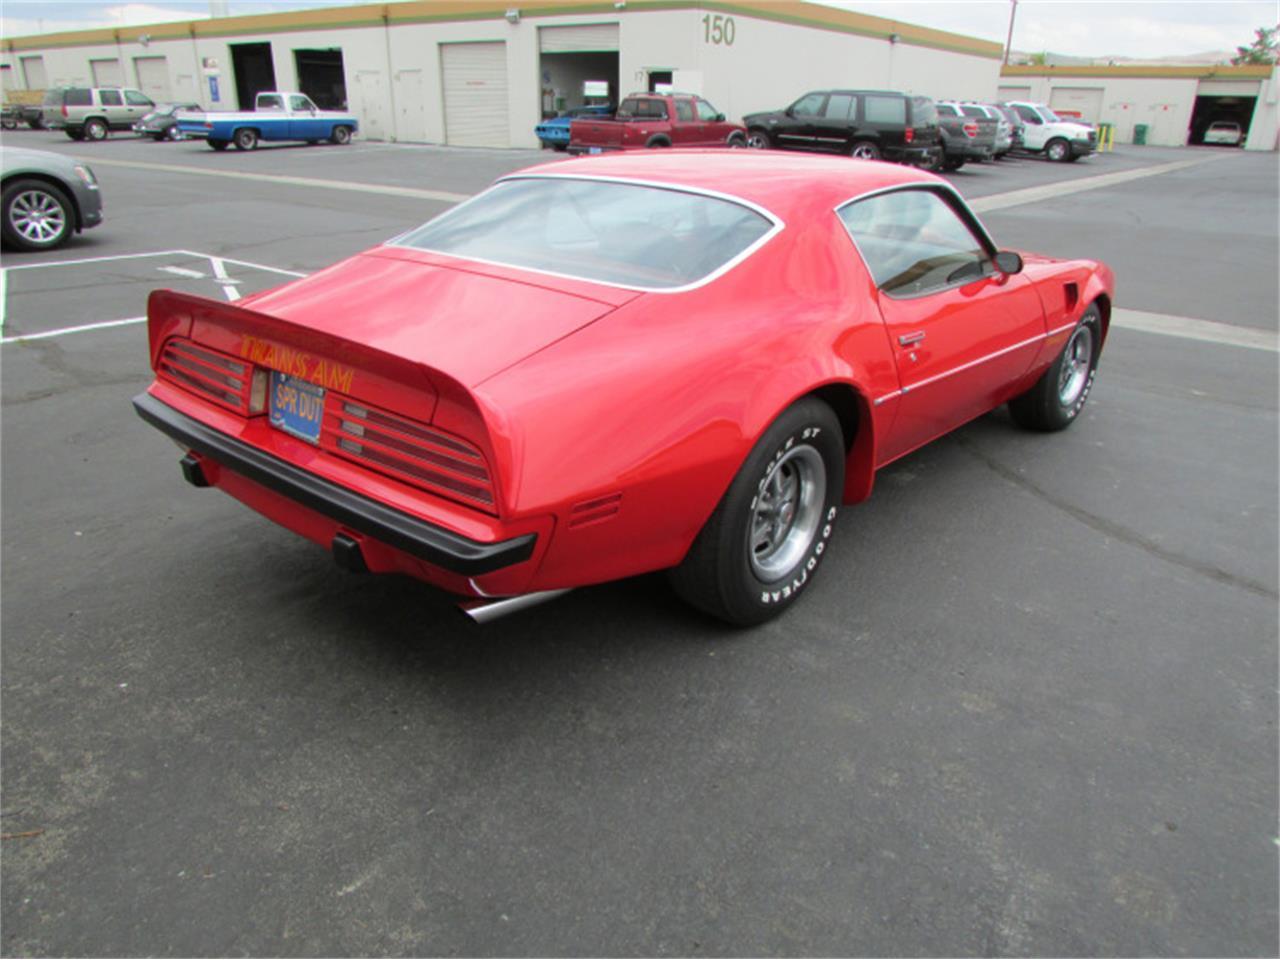 1974 Pontiac Firebird Trans Am (CC-1390522) for sale in Peoria, Arizona